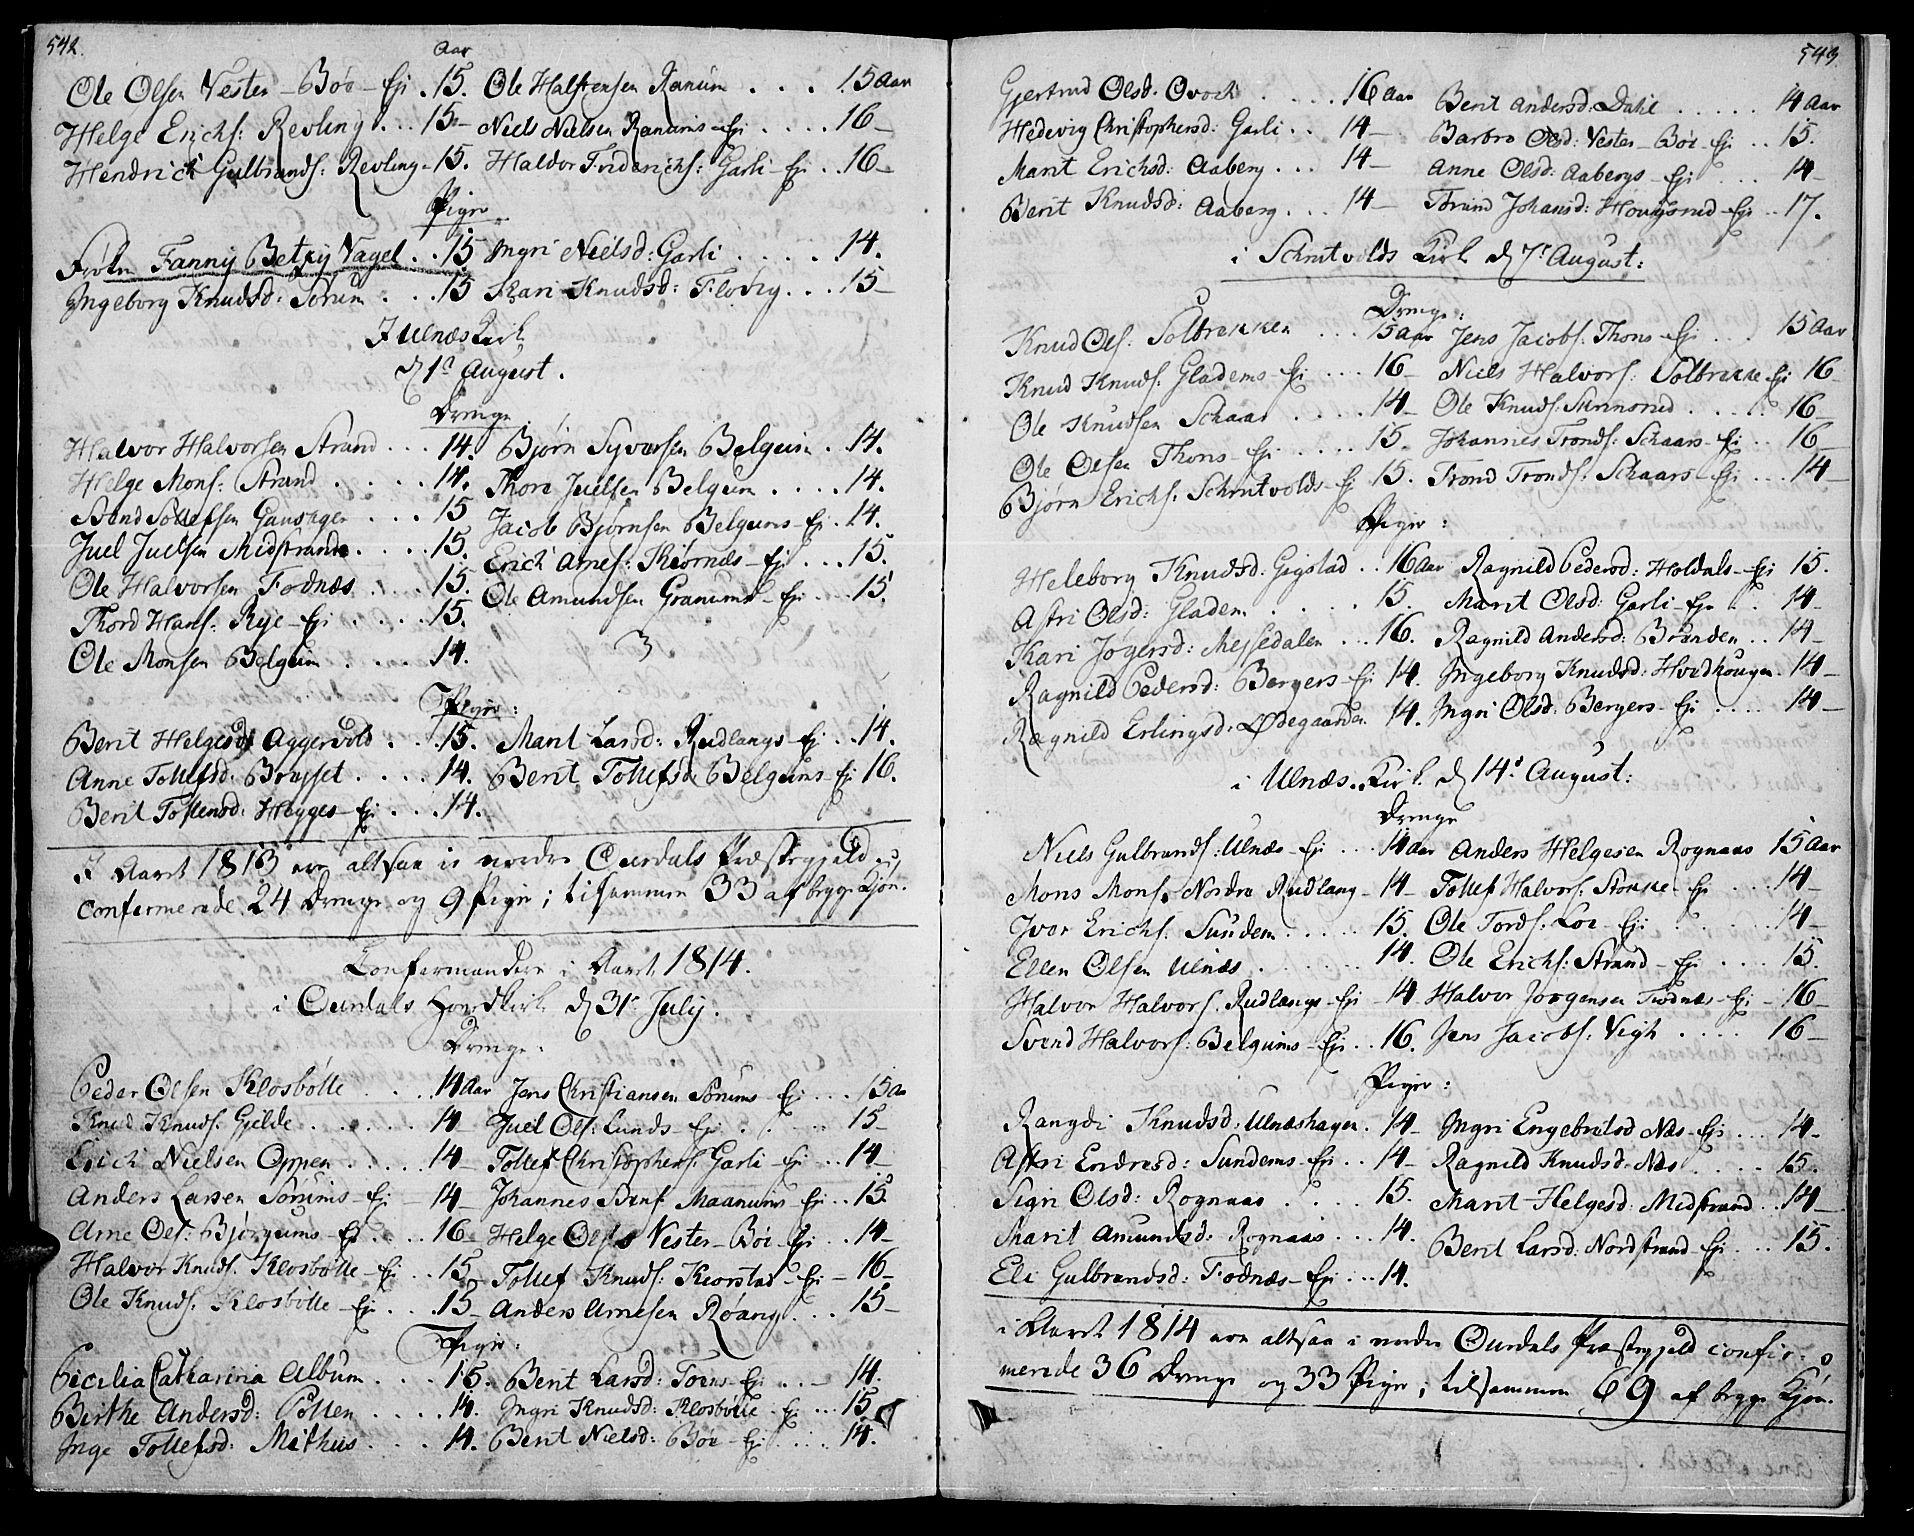 SAH, Nord-Aurdal prestekontor, Ministerialbok nr. 1, 1808-1815, s. 542-543